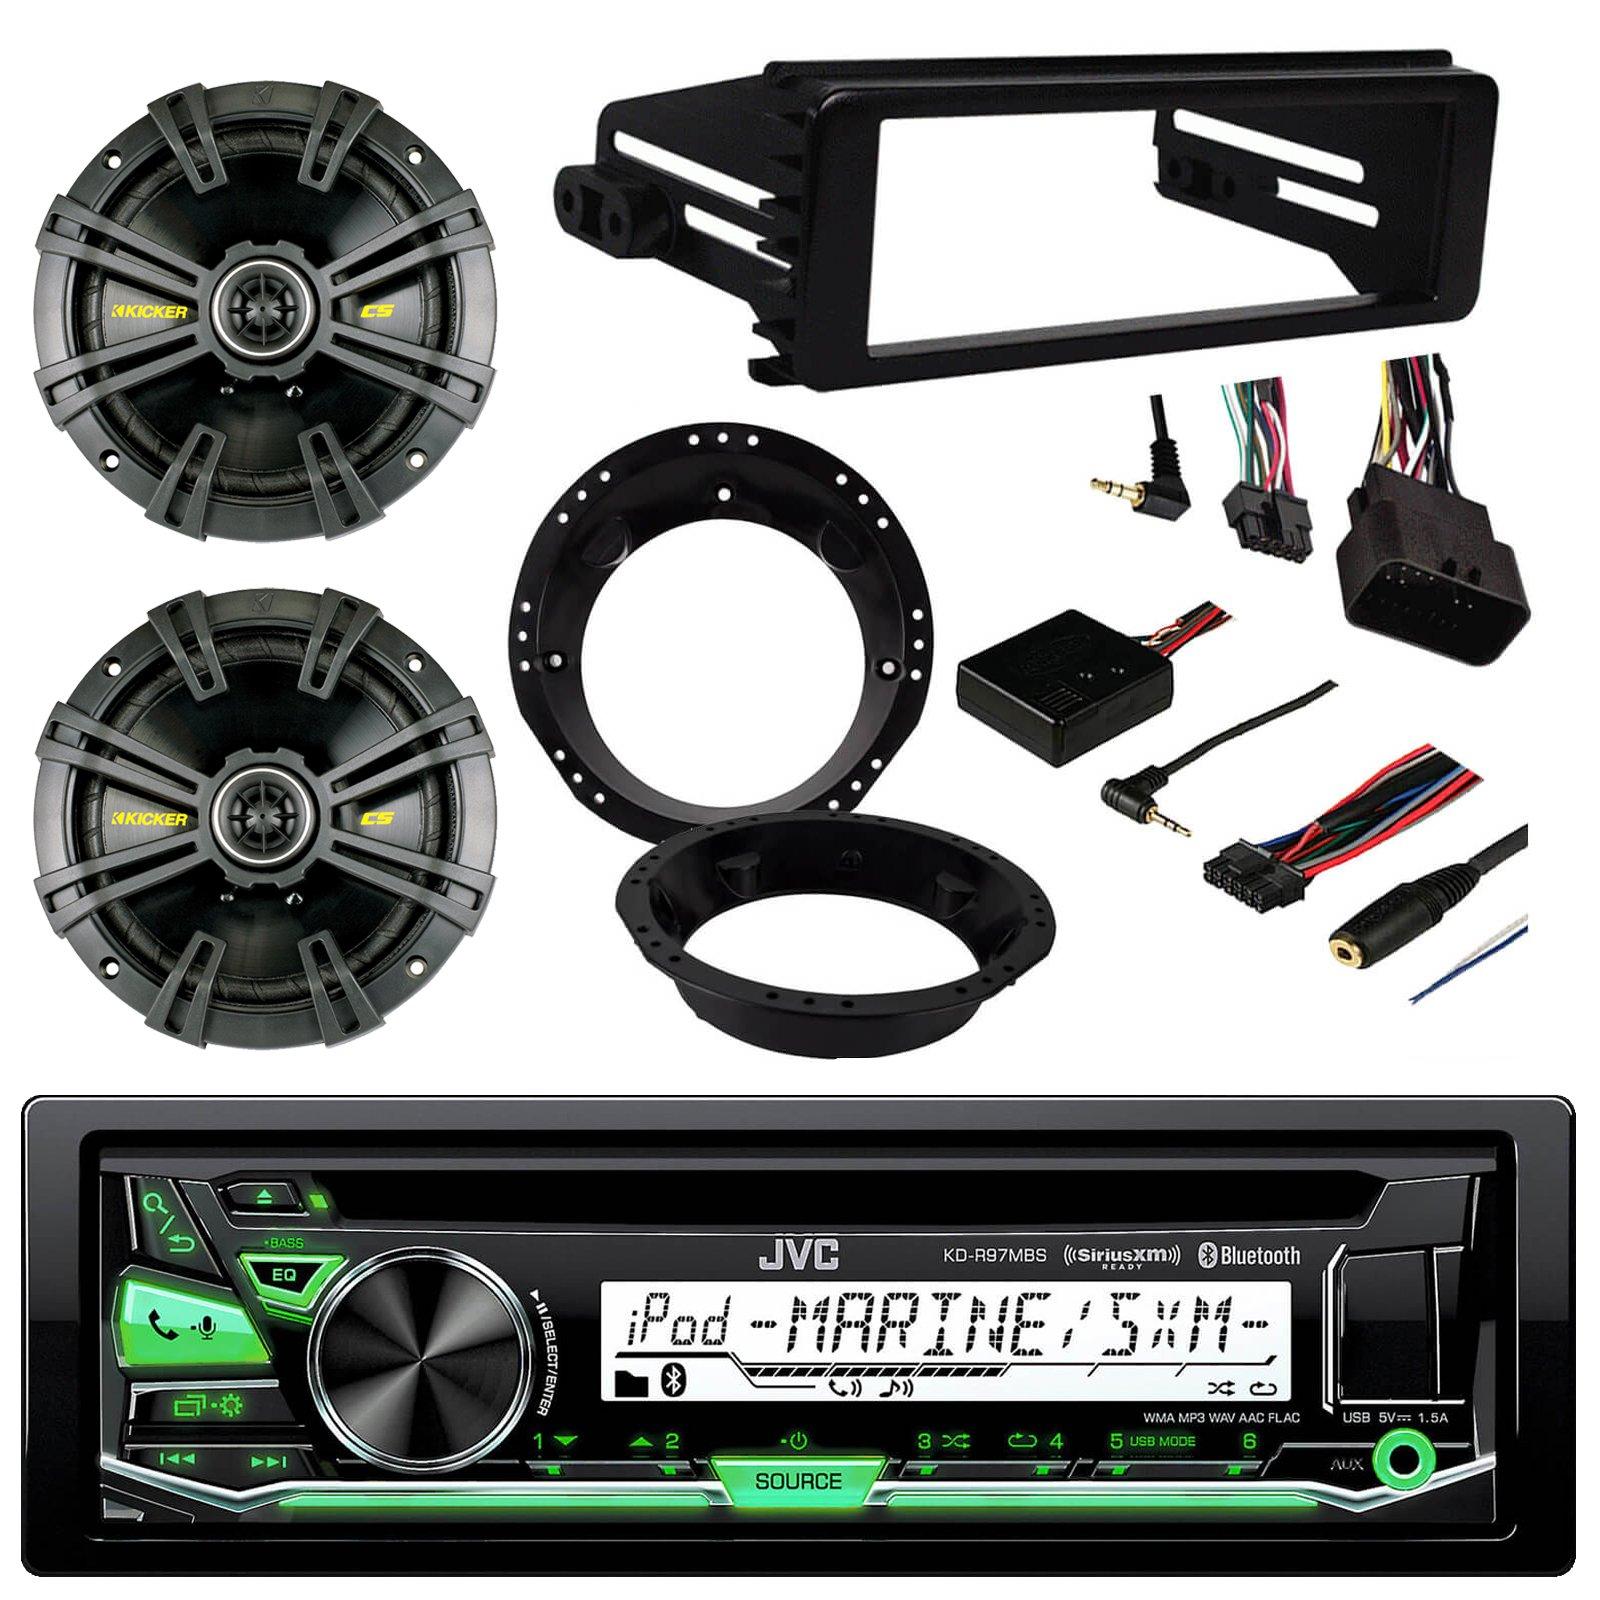 JVC KD-R97MBS CD MP3 Bluetooth Marine Outdoor Radio Receiver, 2 x Kicker 40CS674 6-3/4'' 600 Watt Black Car Speakers, Metra Mounting Ring, Metra Stereo Cover, Metra Steering Wheel Control Interface